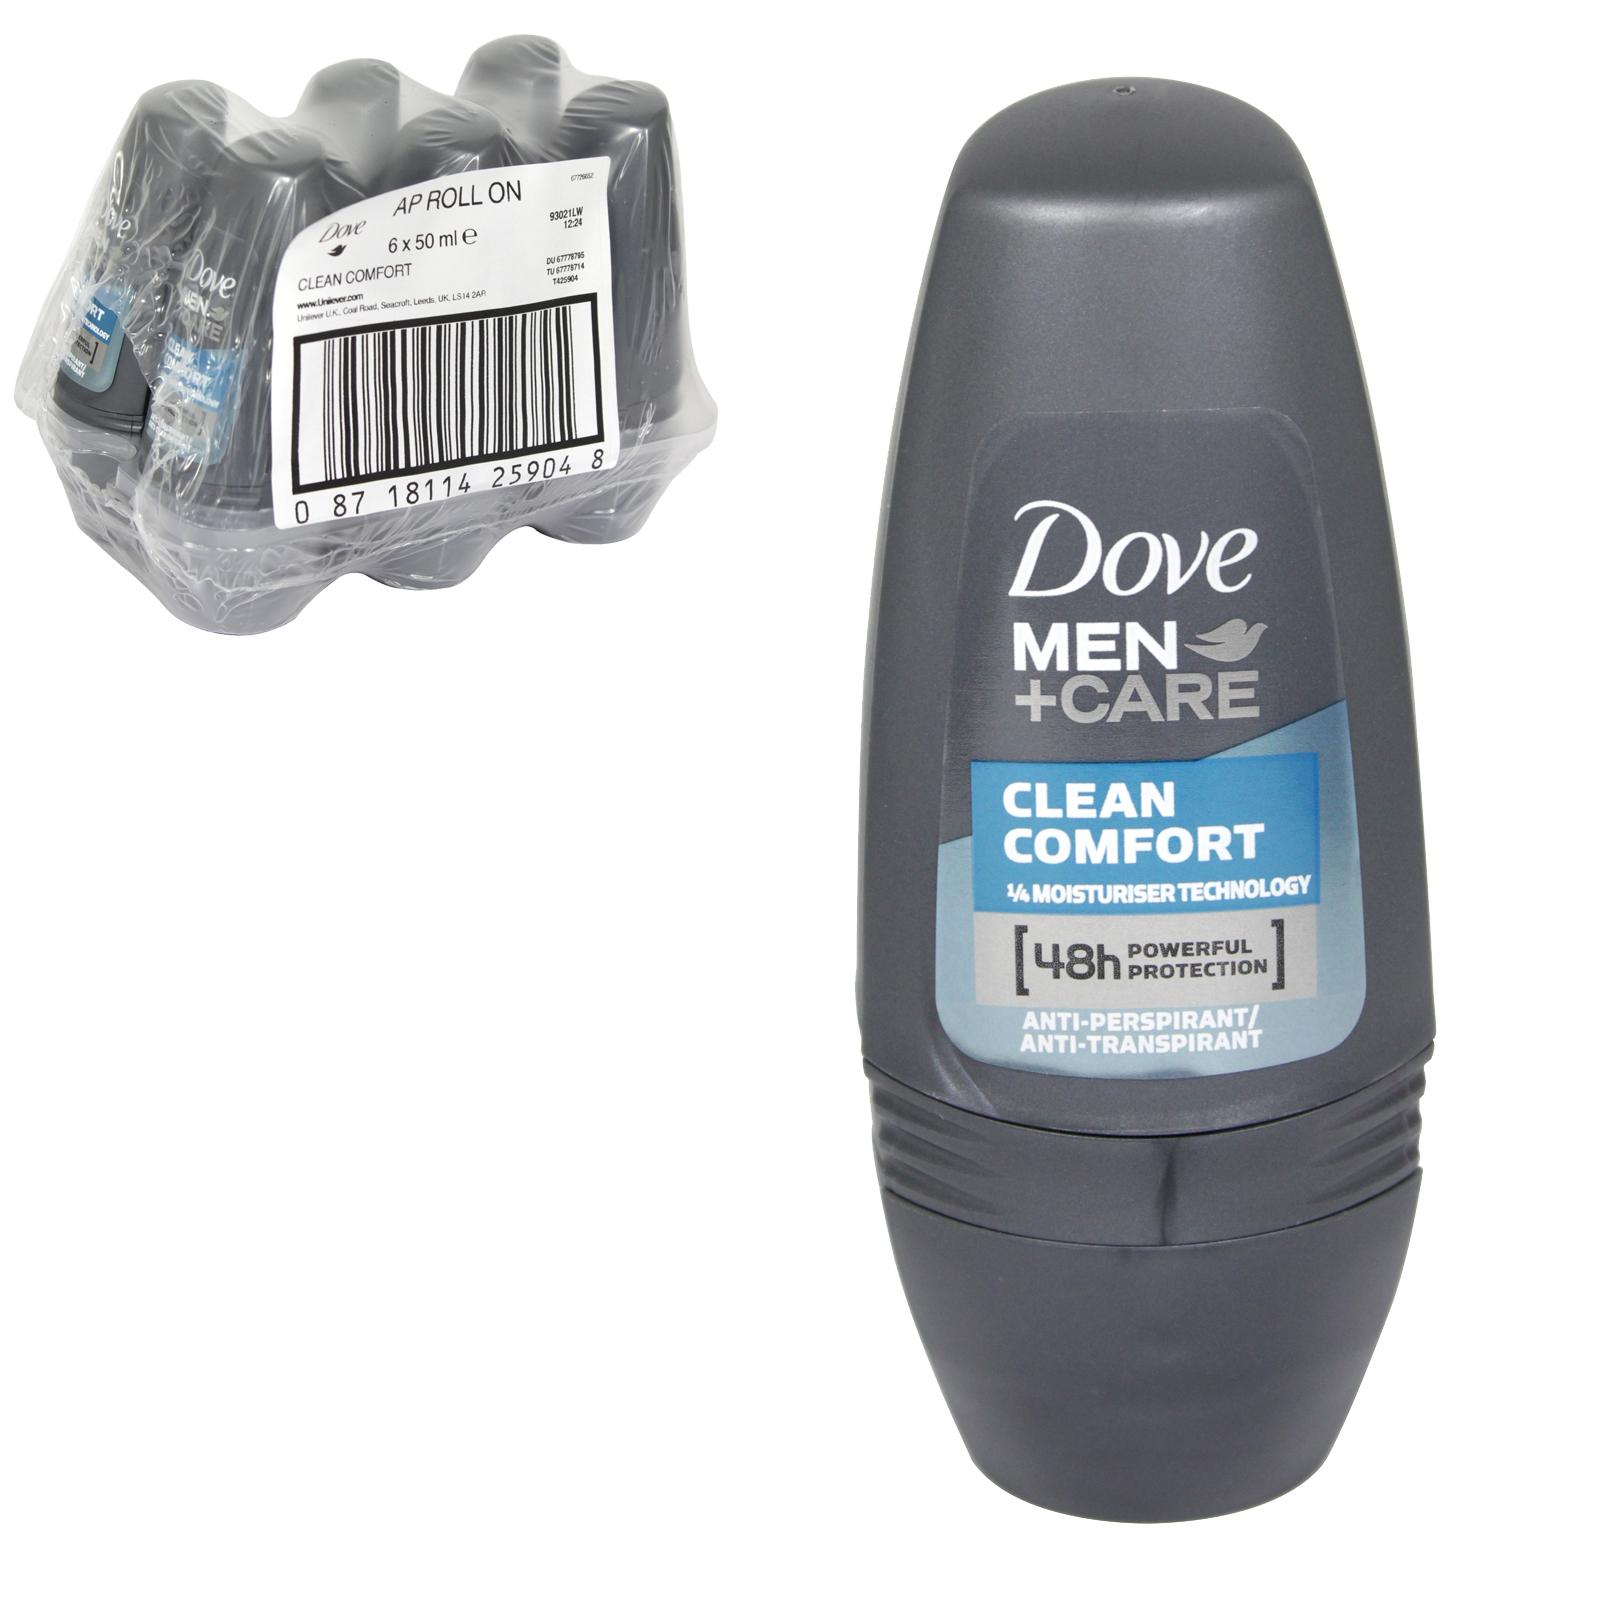 DOVE MEN+CARE R/O 50ML CLEAN COMFORT X 6